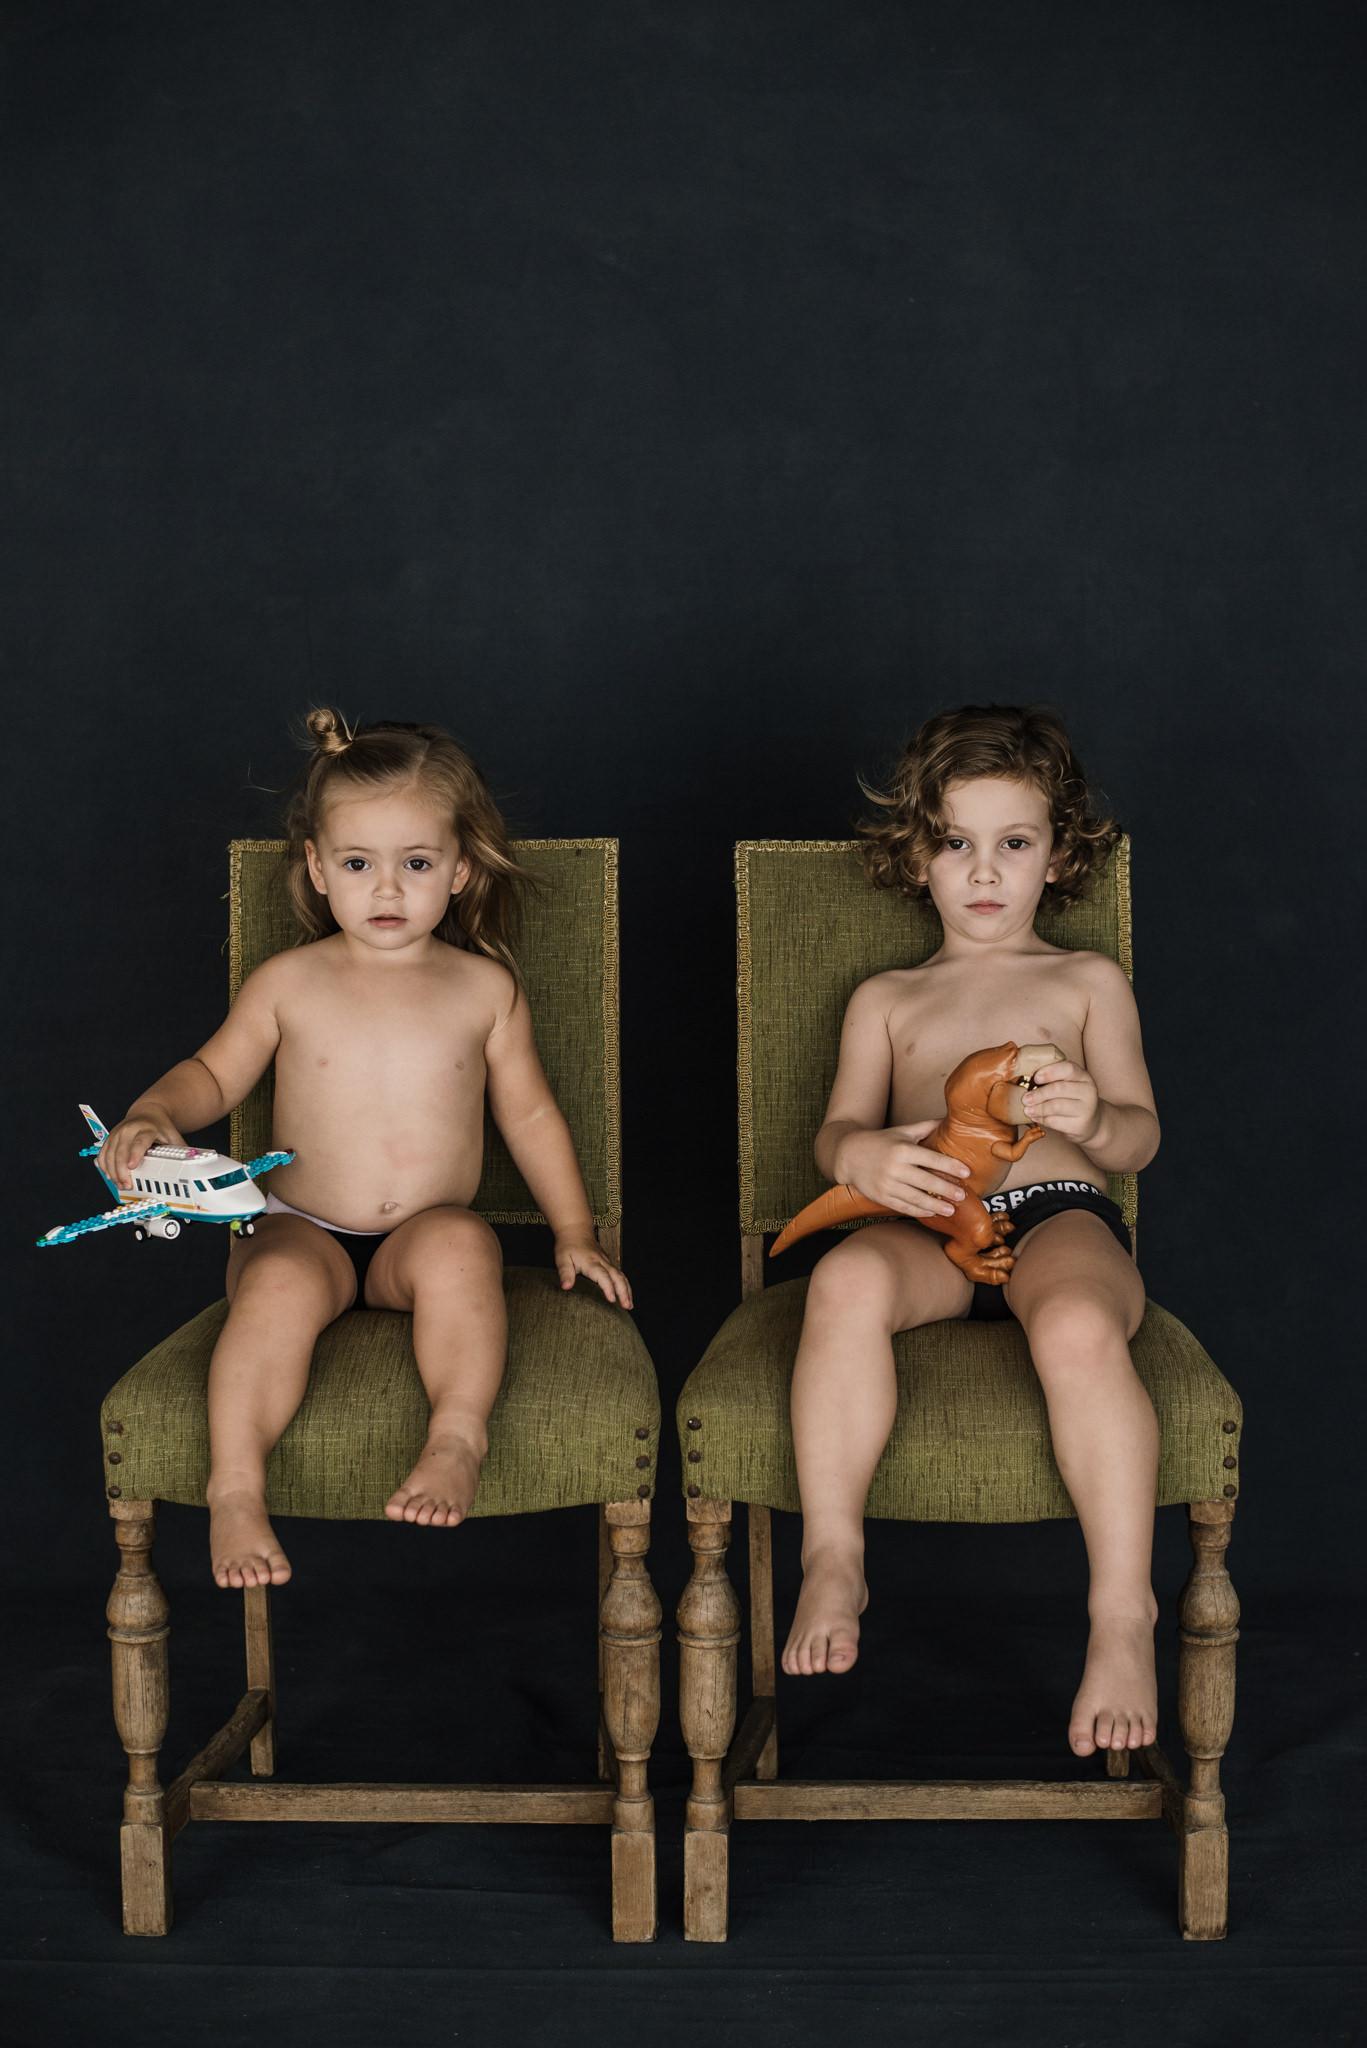 Bree + kids-14.jpg